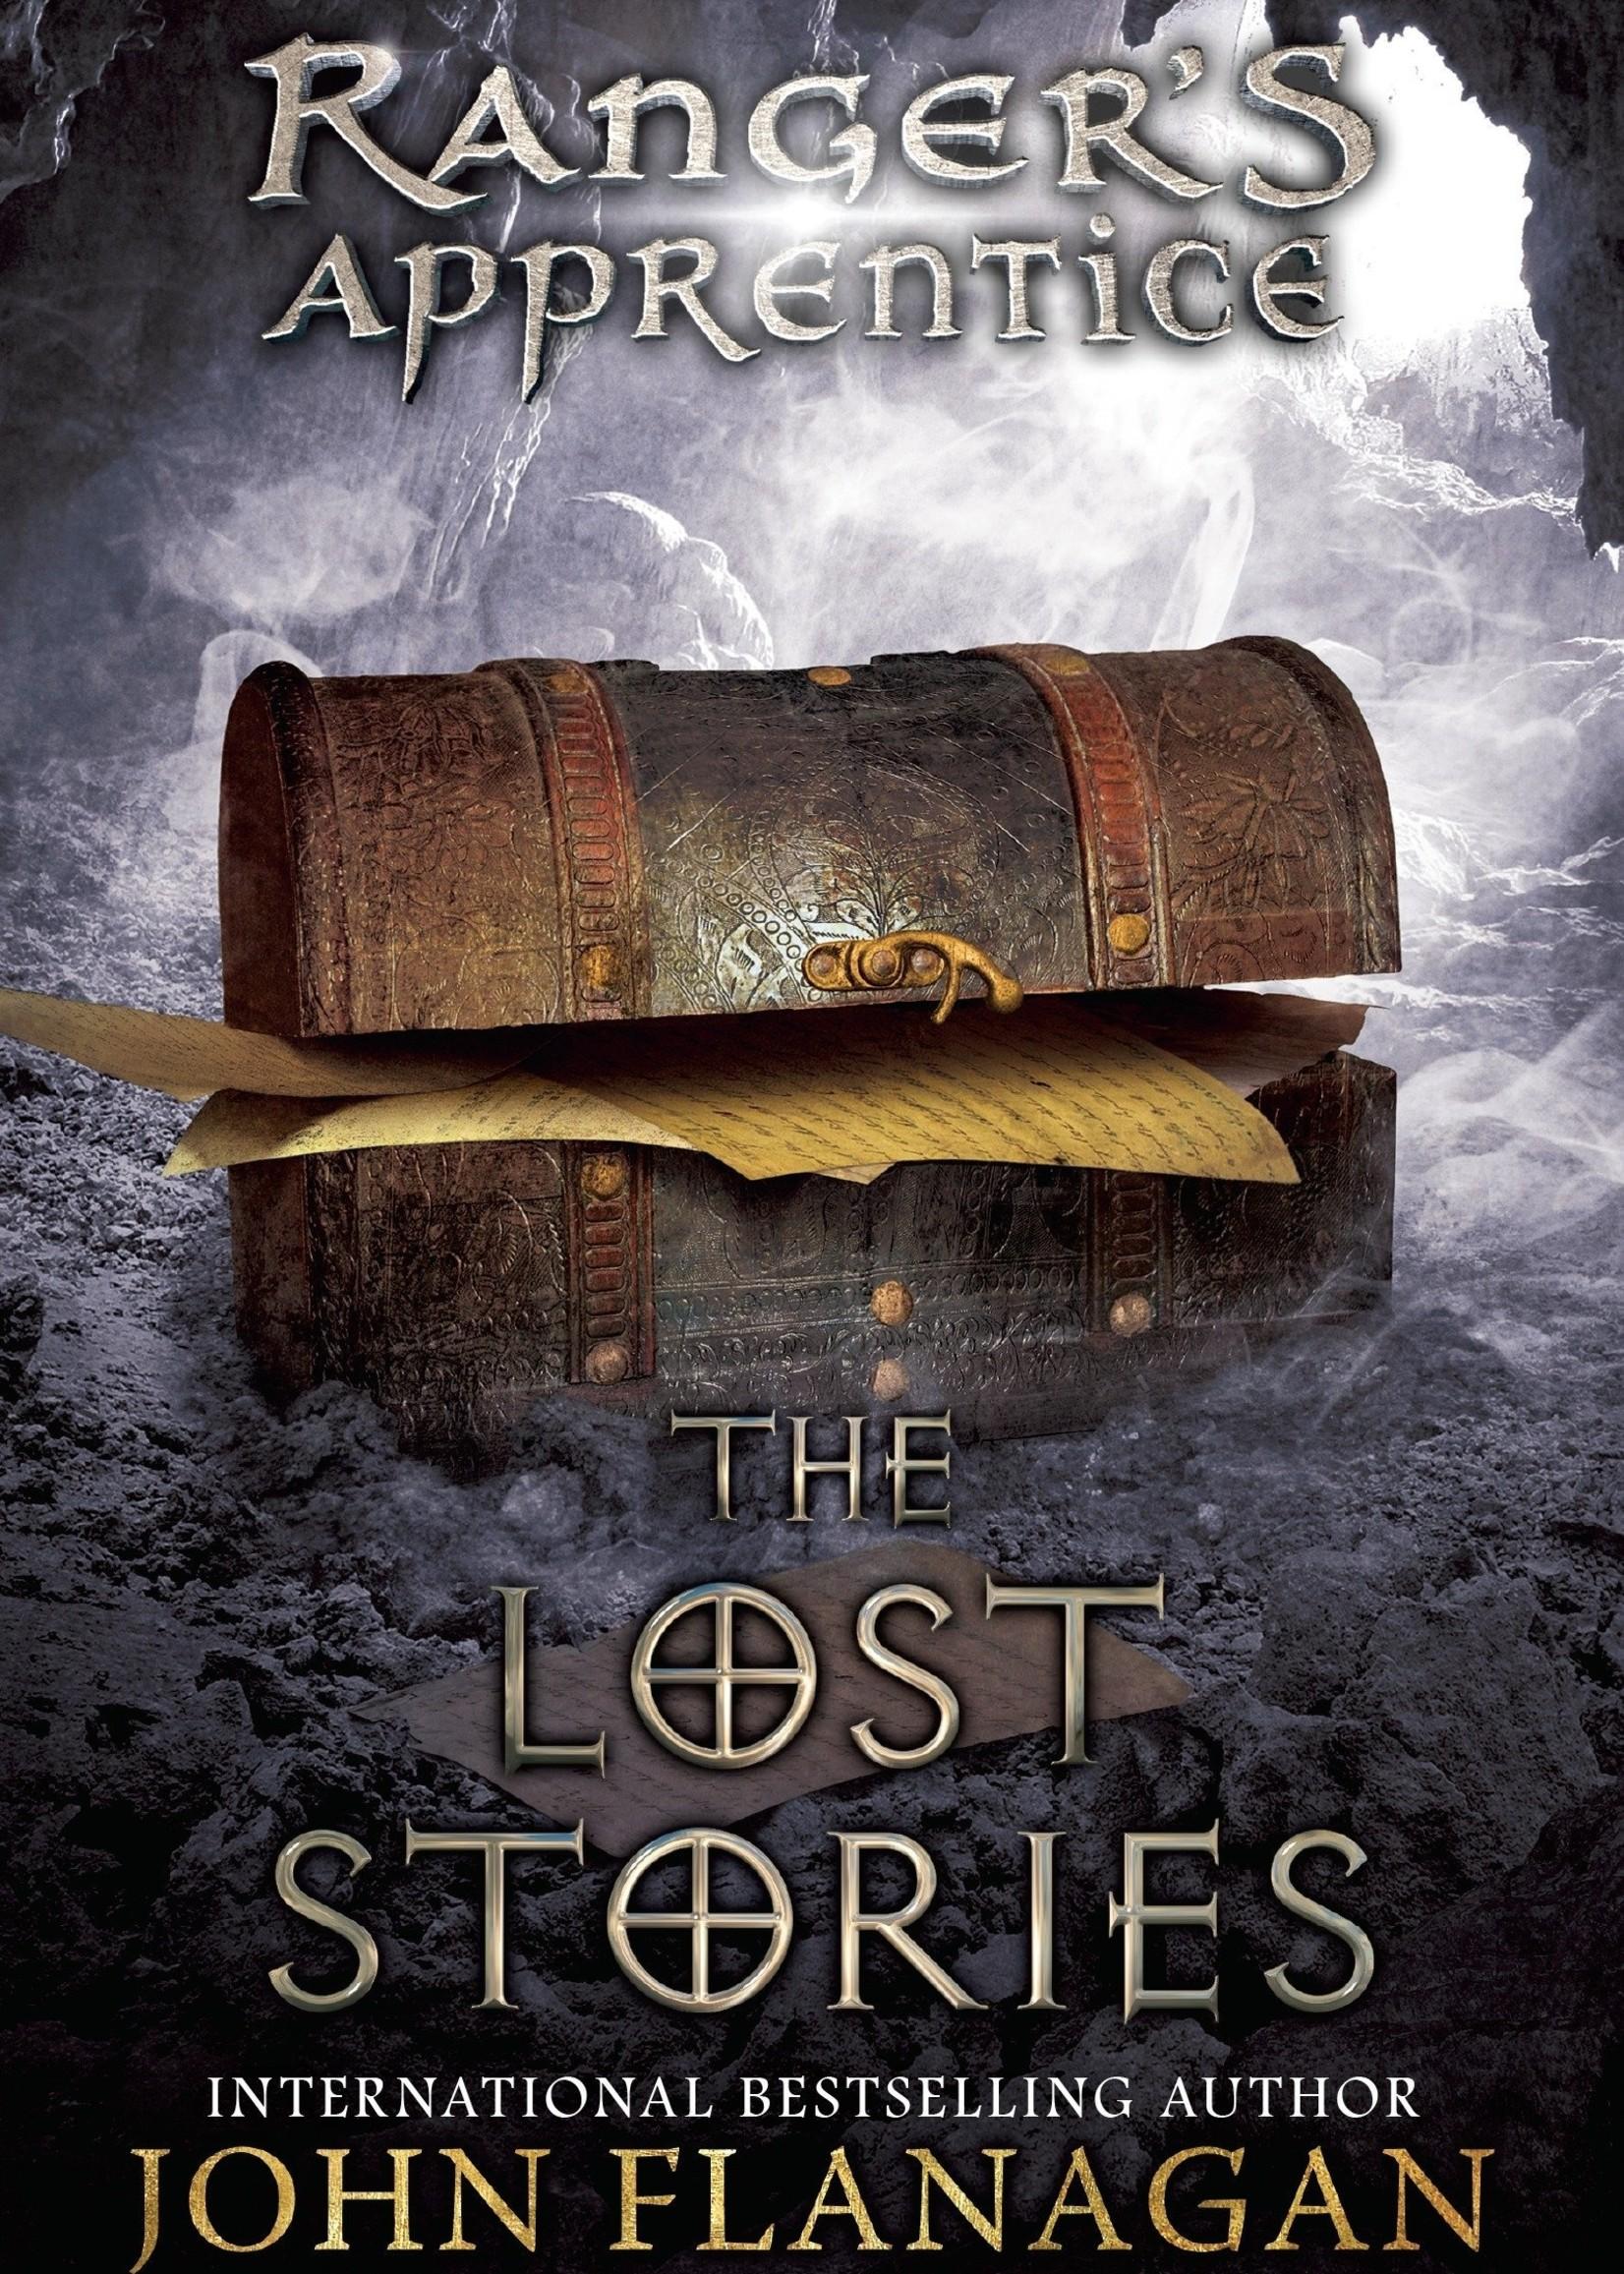 Ranger's Apprentice #11, The Lost Stories - Paperback